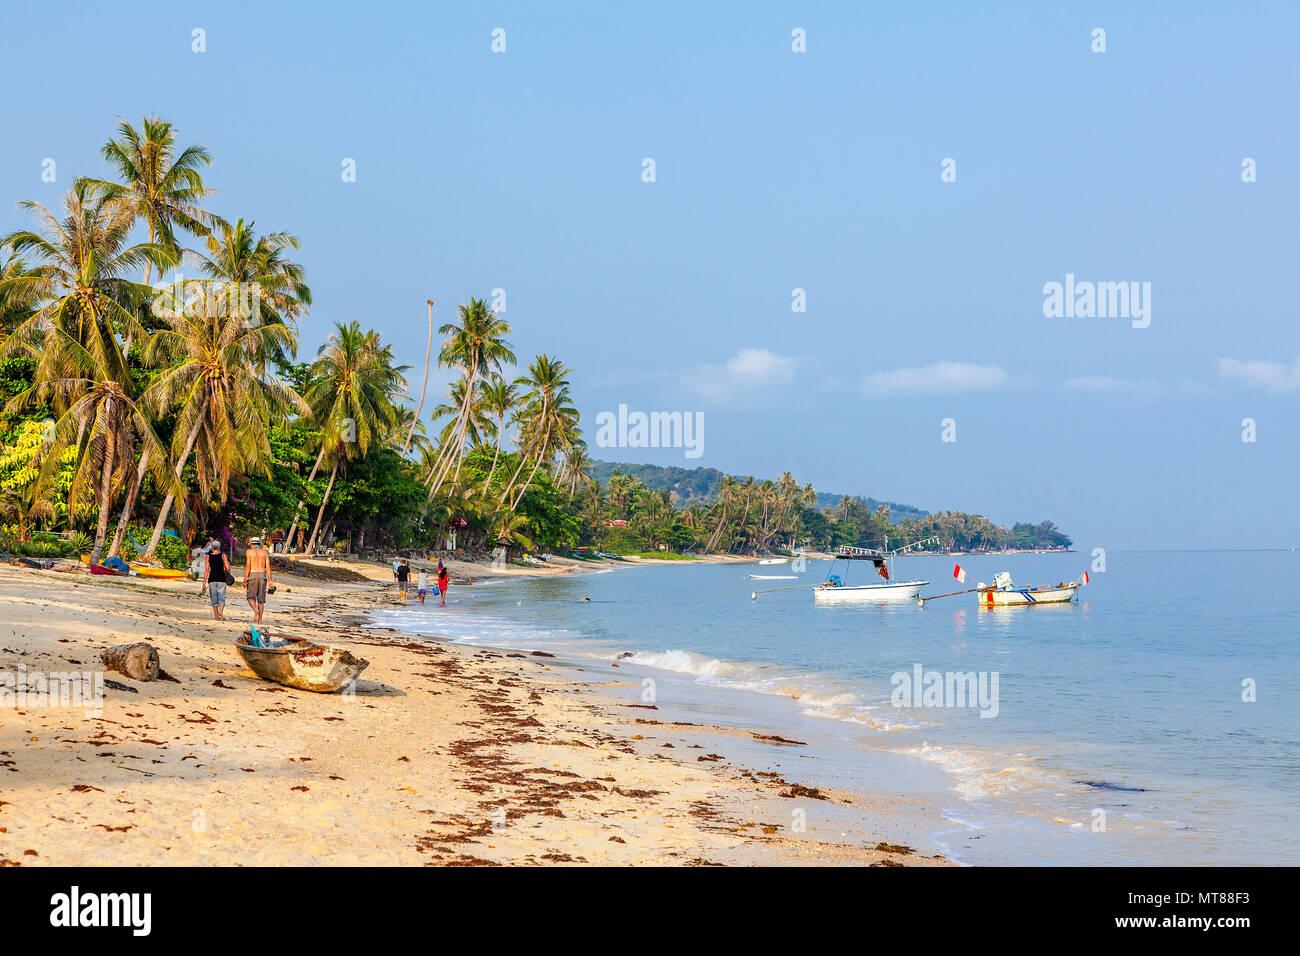 Sunny morning on the beach of Bang Po. Samui Island. Thailand. - Stock Image